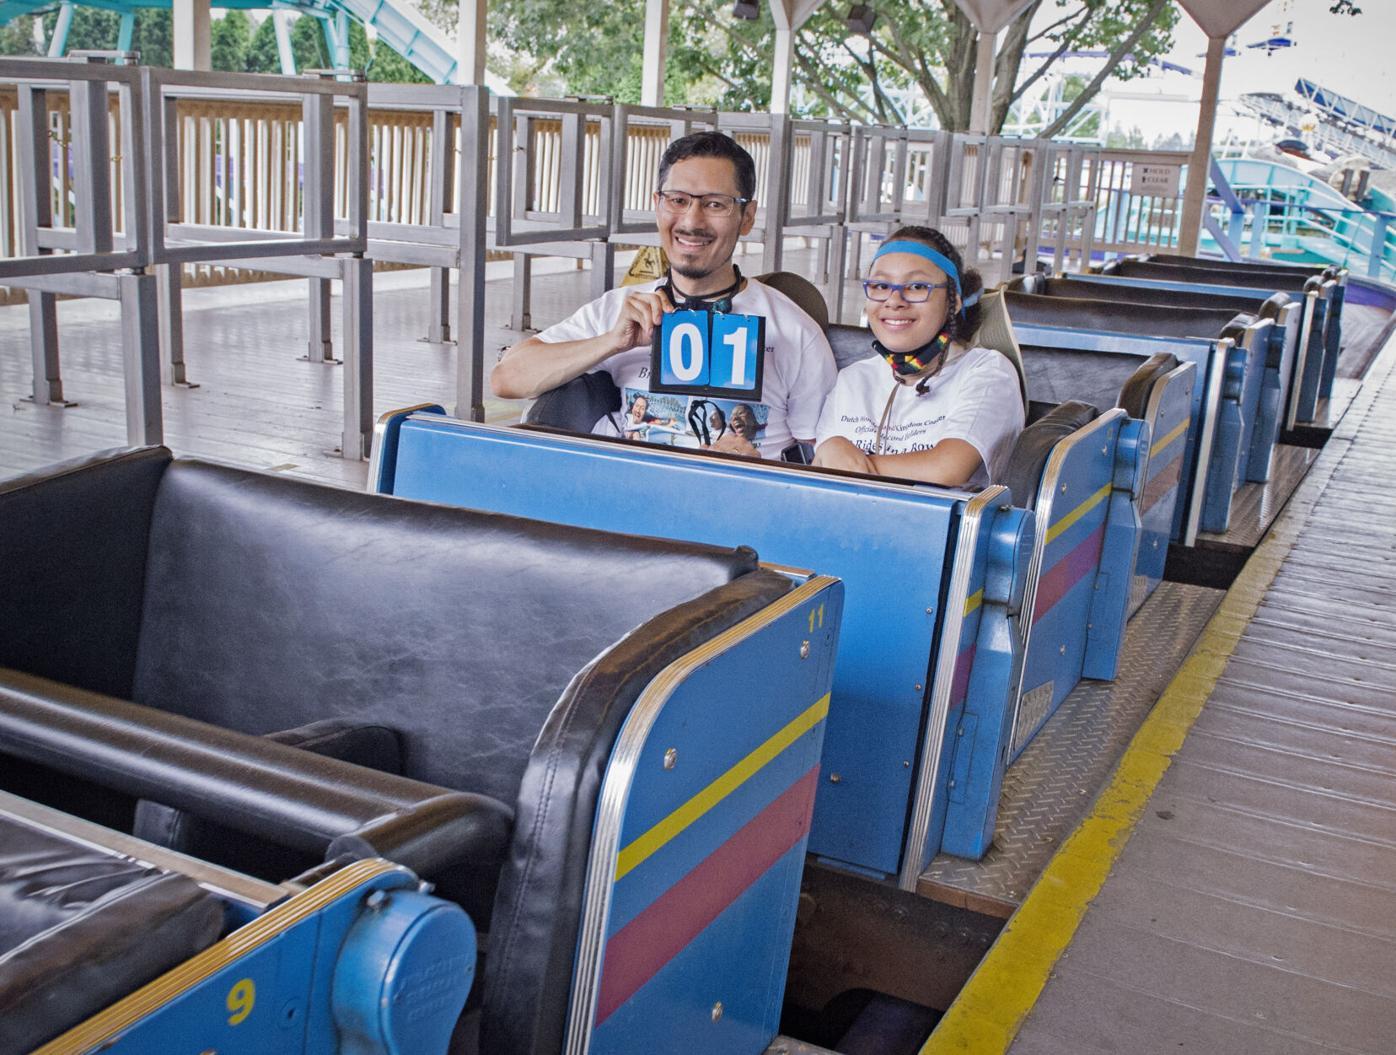 roller coaster record